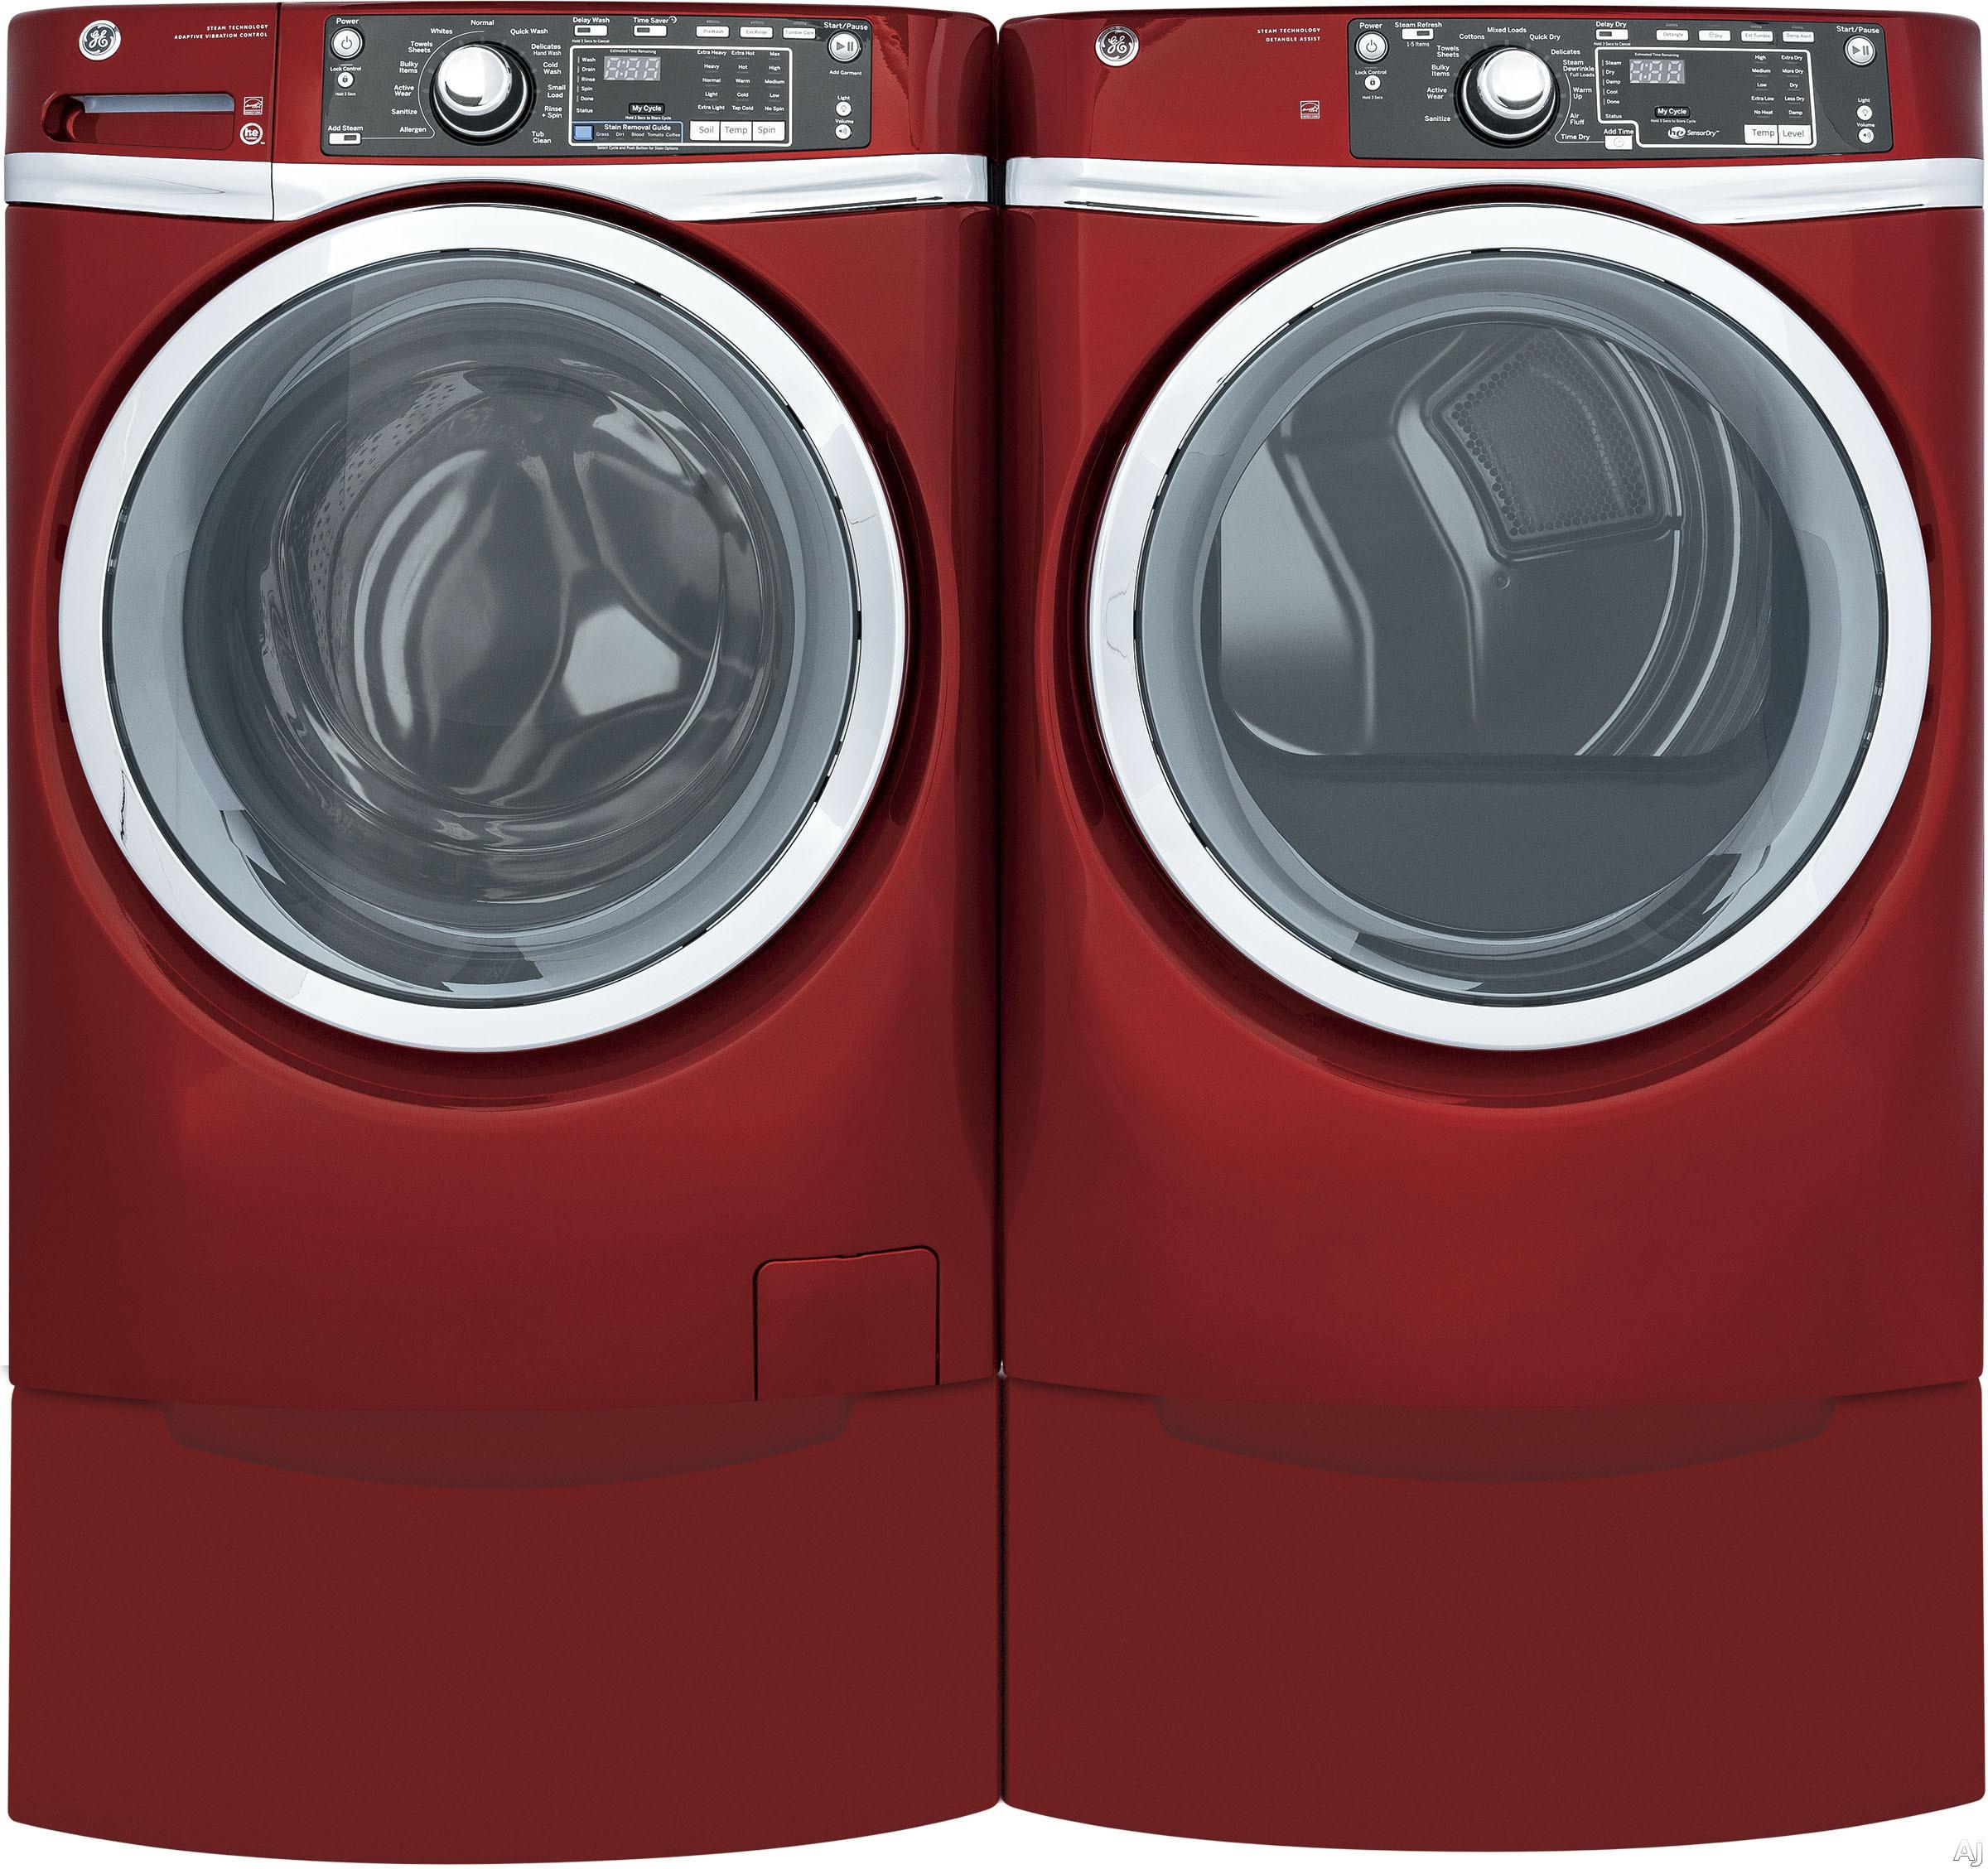 Washer And Dryer Pedestals Usa